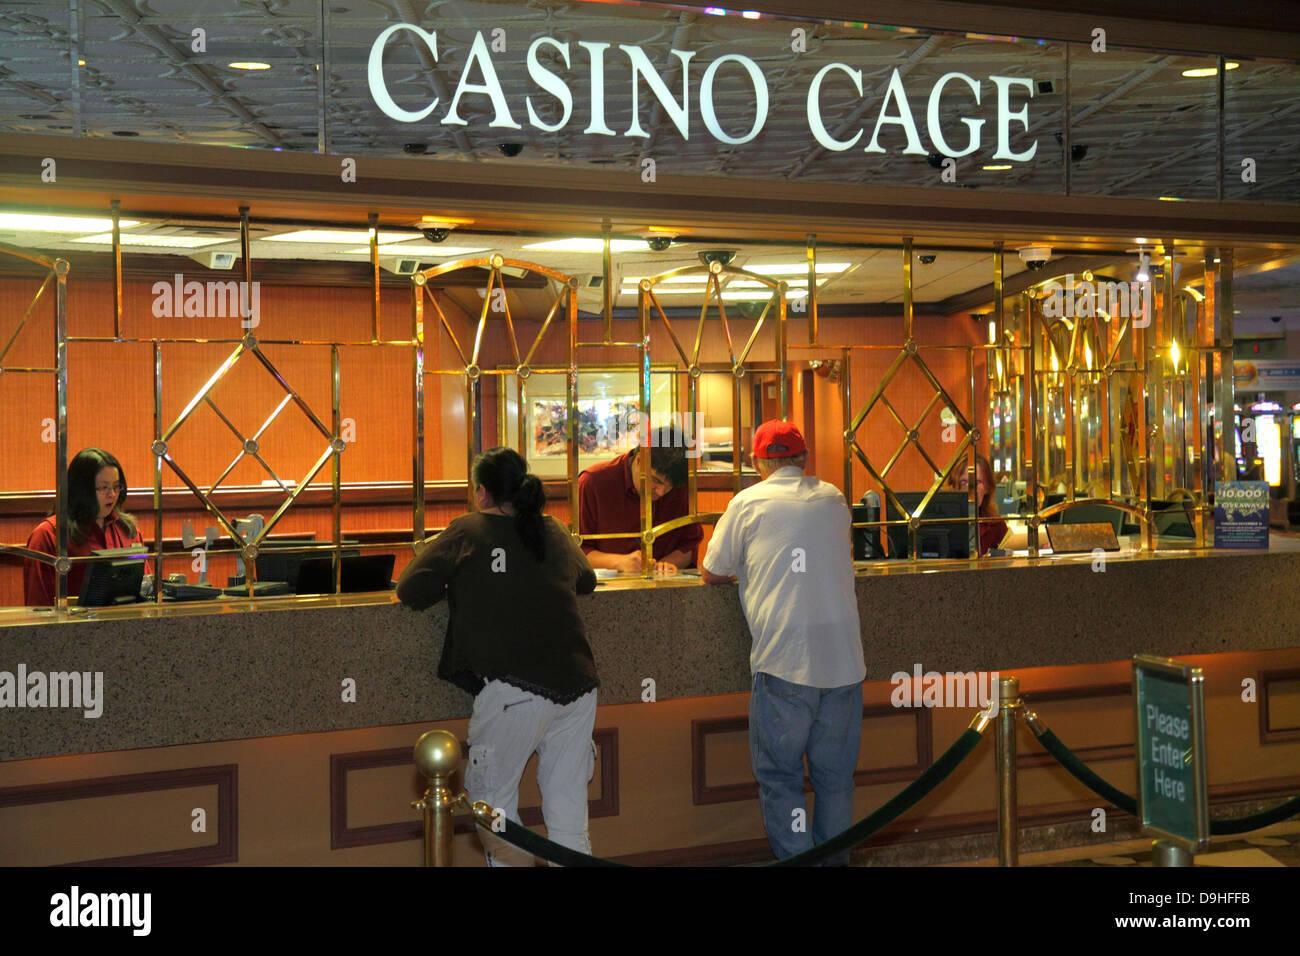 Nevada Las Vegas Las Vegas Hotel & Casino LVH cage gambling gamblers - Stock Image